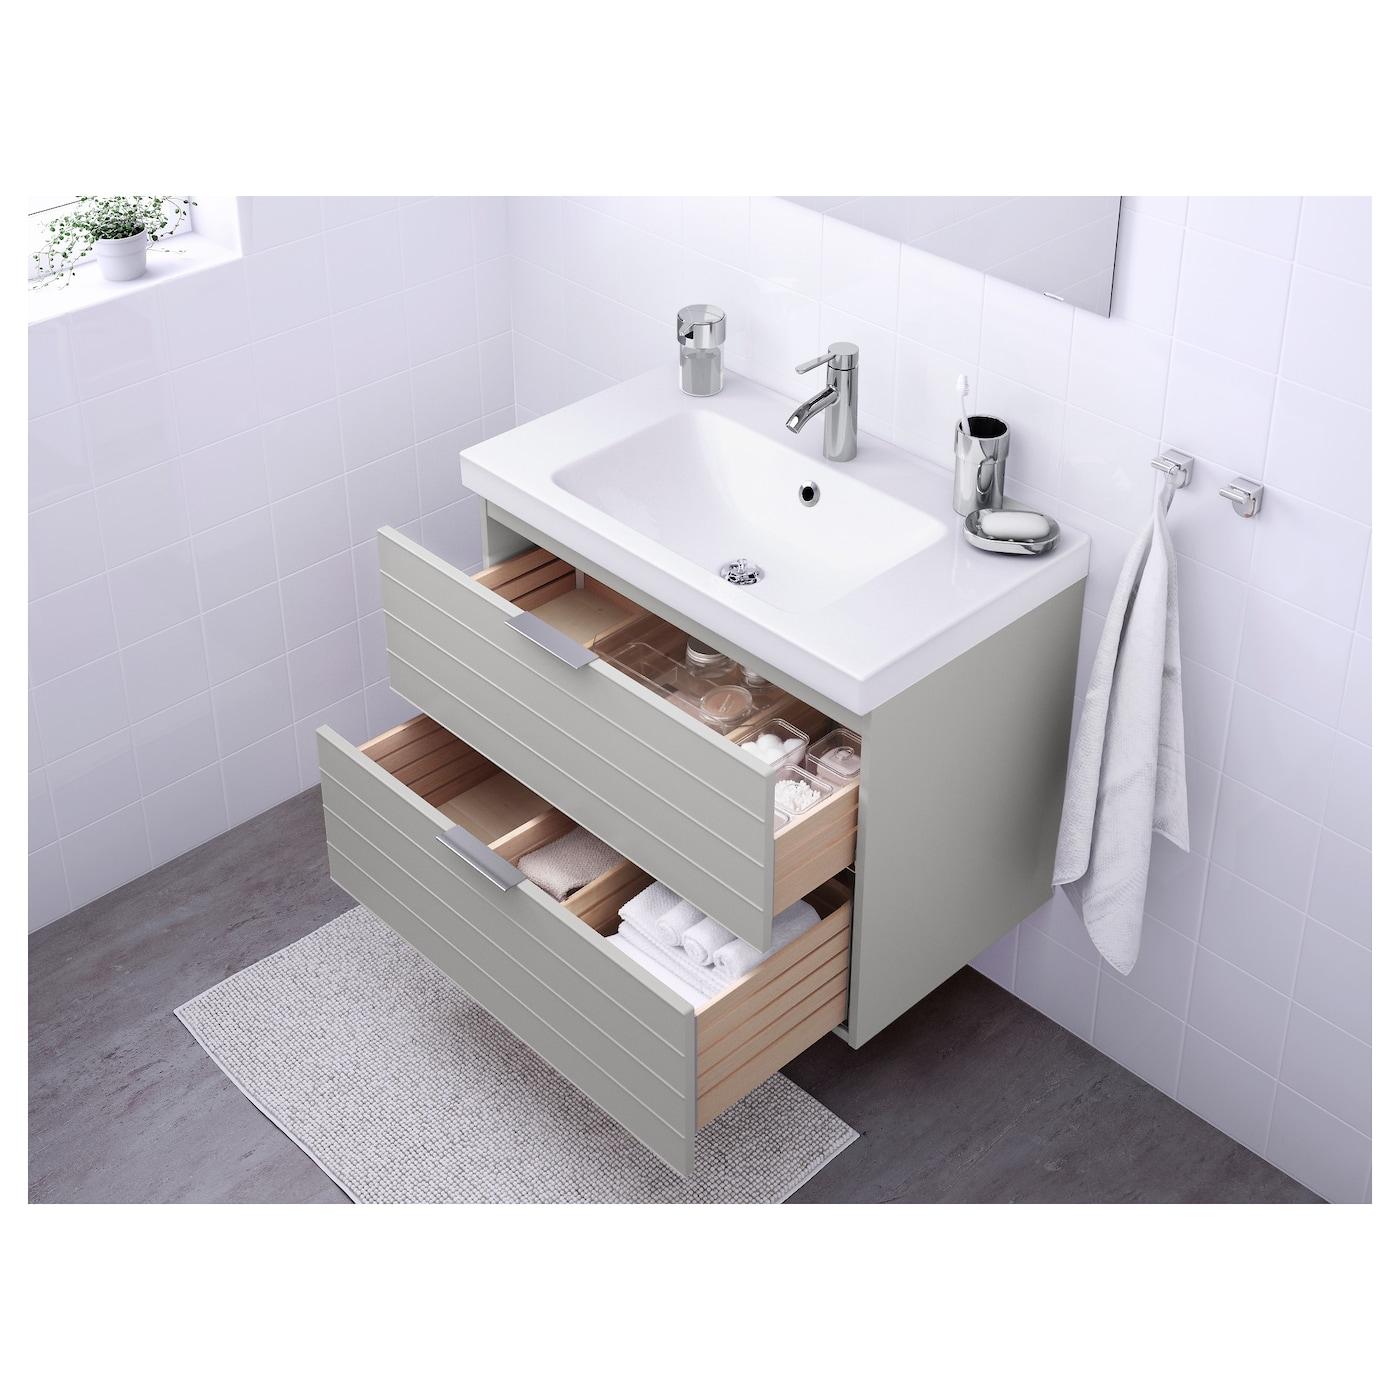 Odensvik godmorgon meuble lavabo 2tir gris clair 80x49x64 for Bathroom cabinets montreal